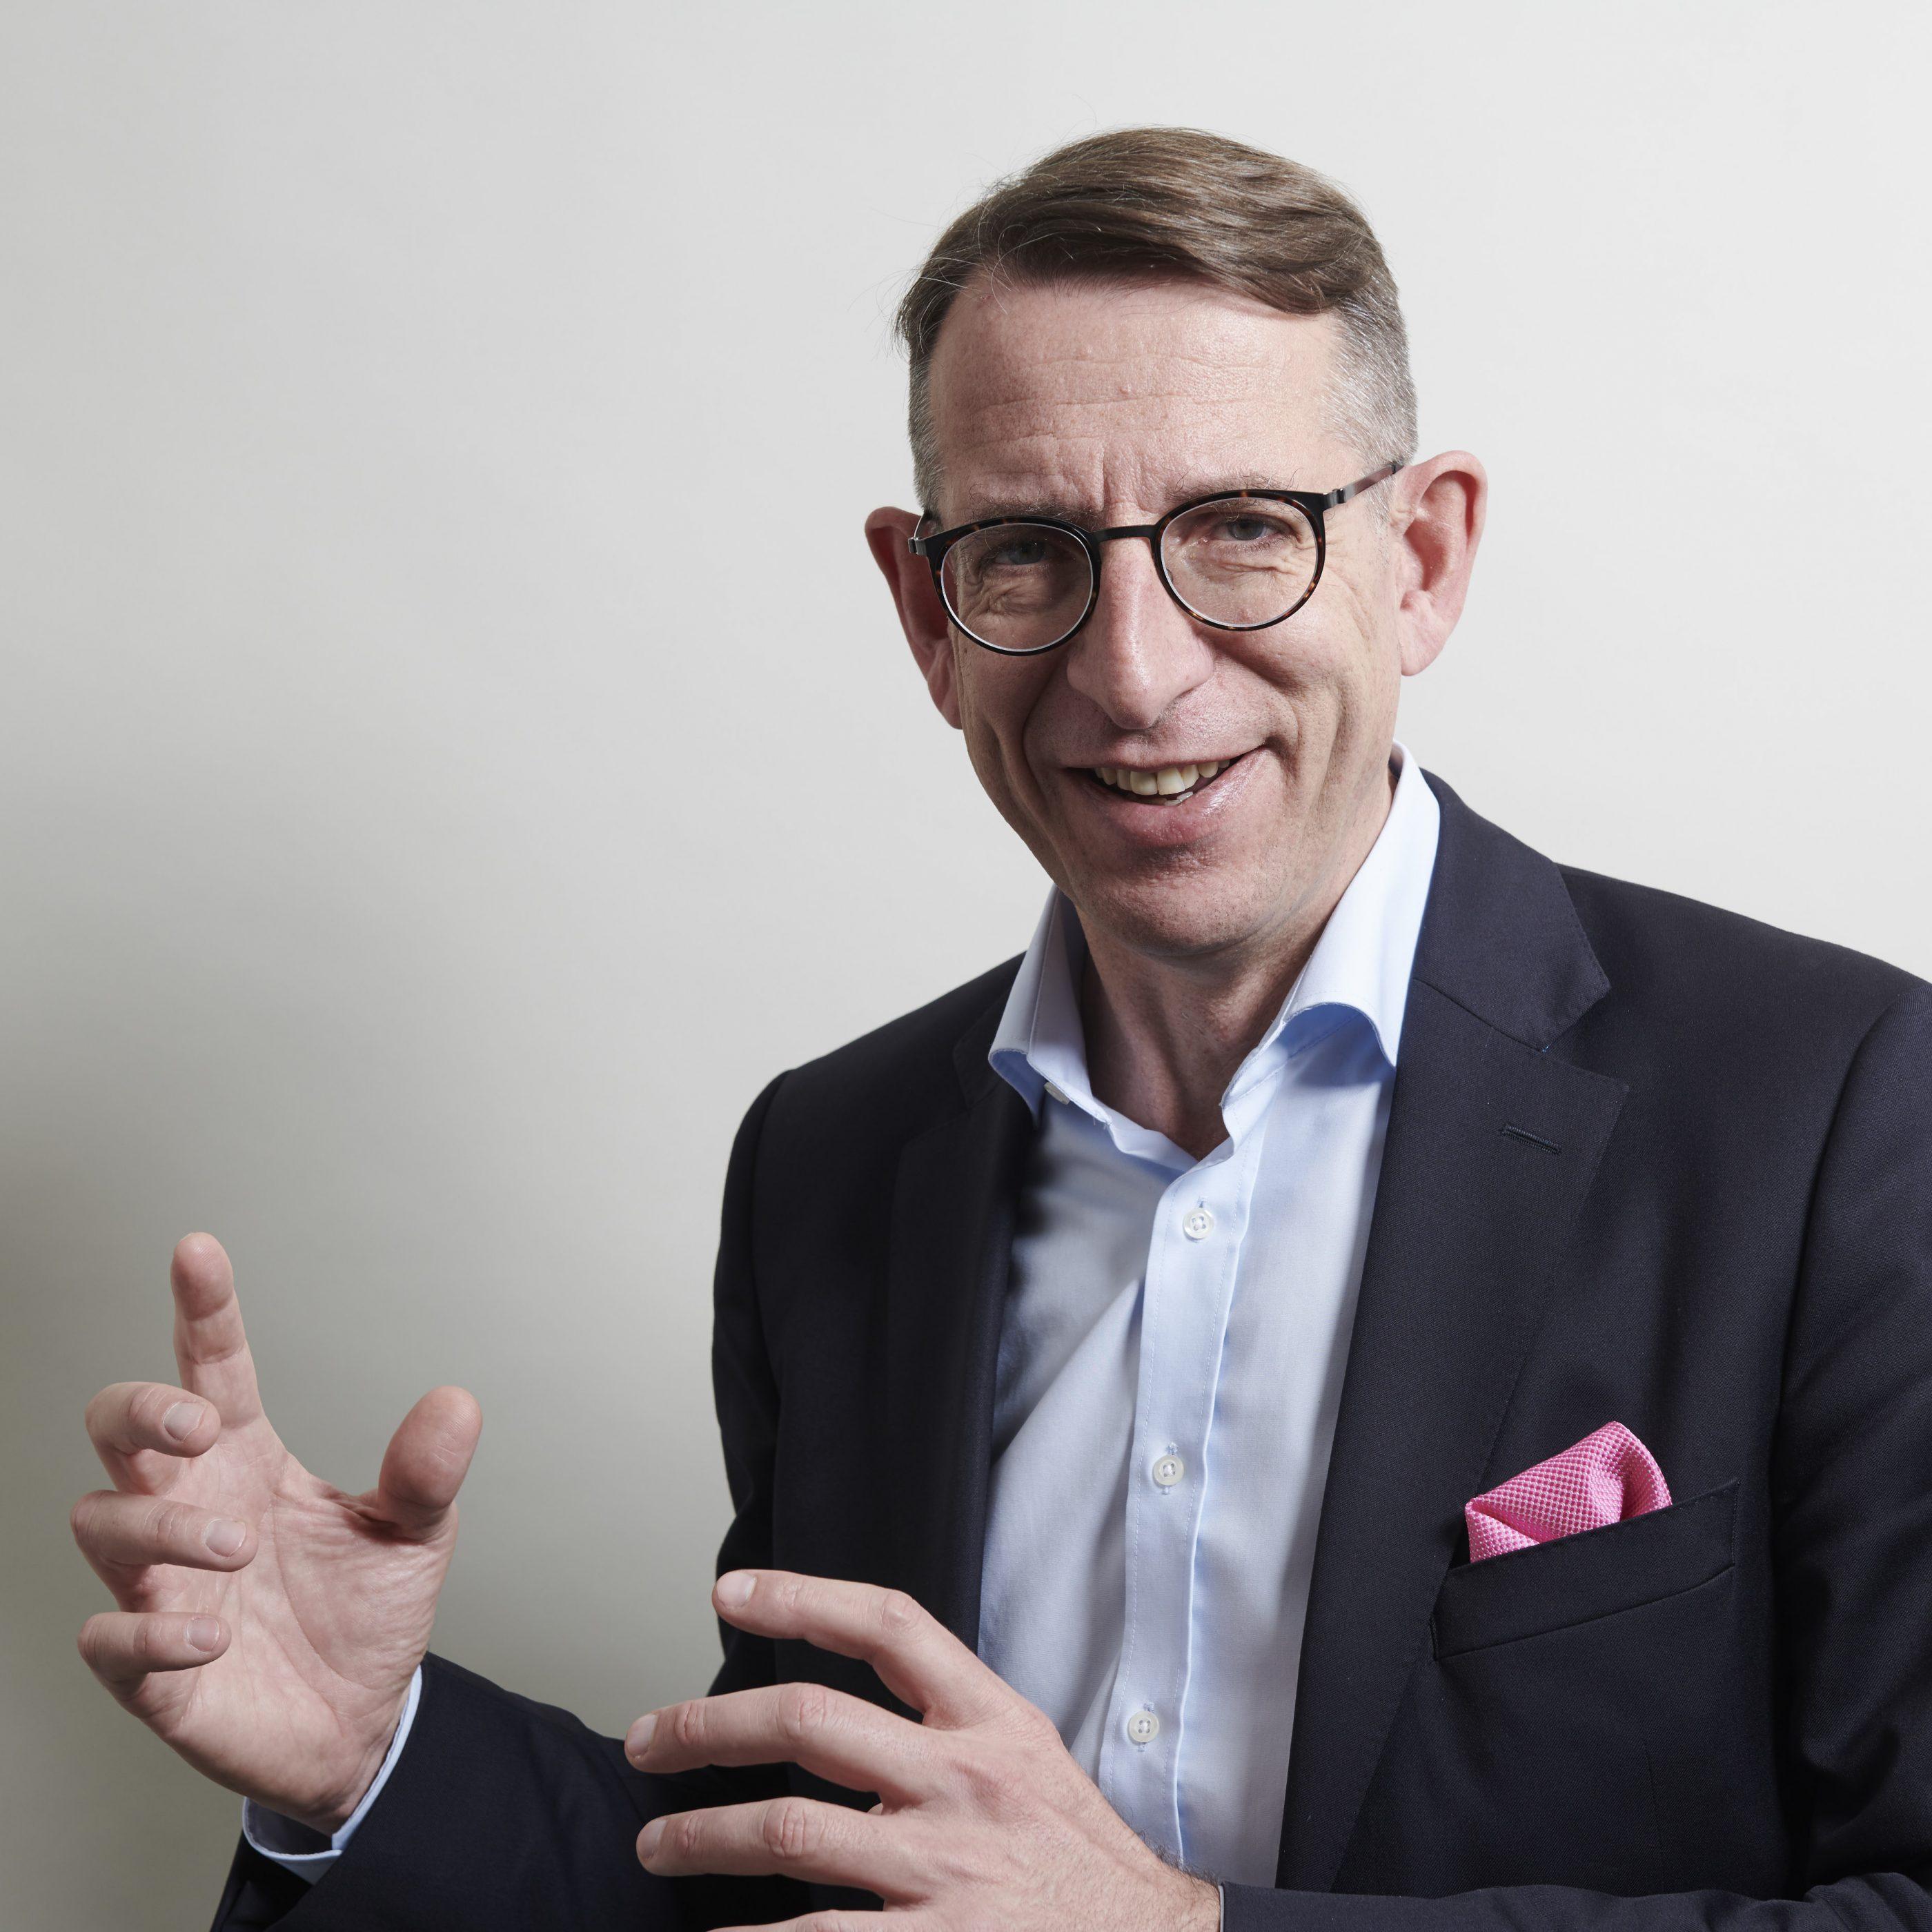 Dr. Frank-Jürgen Richter Entrepreneur, Economic Advisor, Author and Commentator